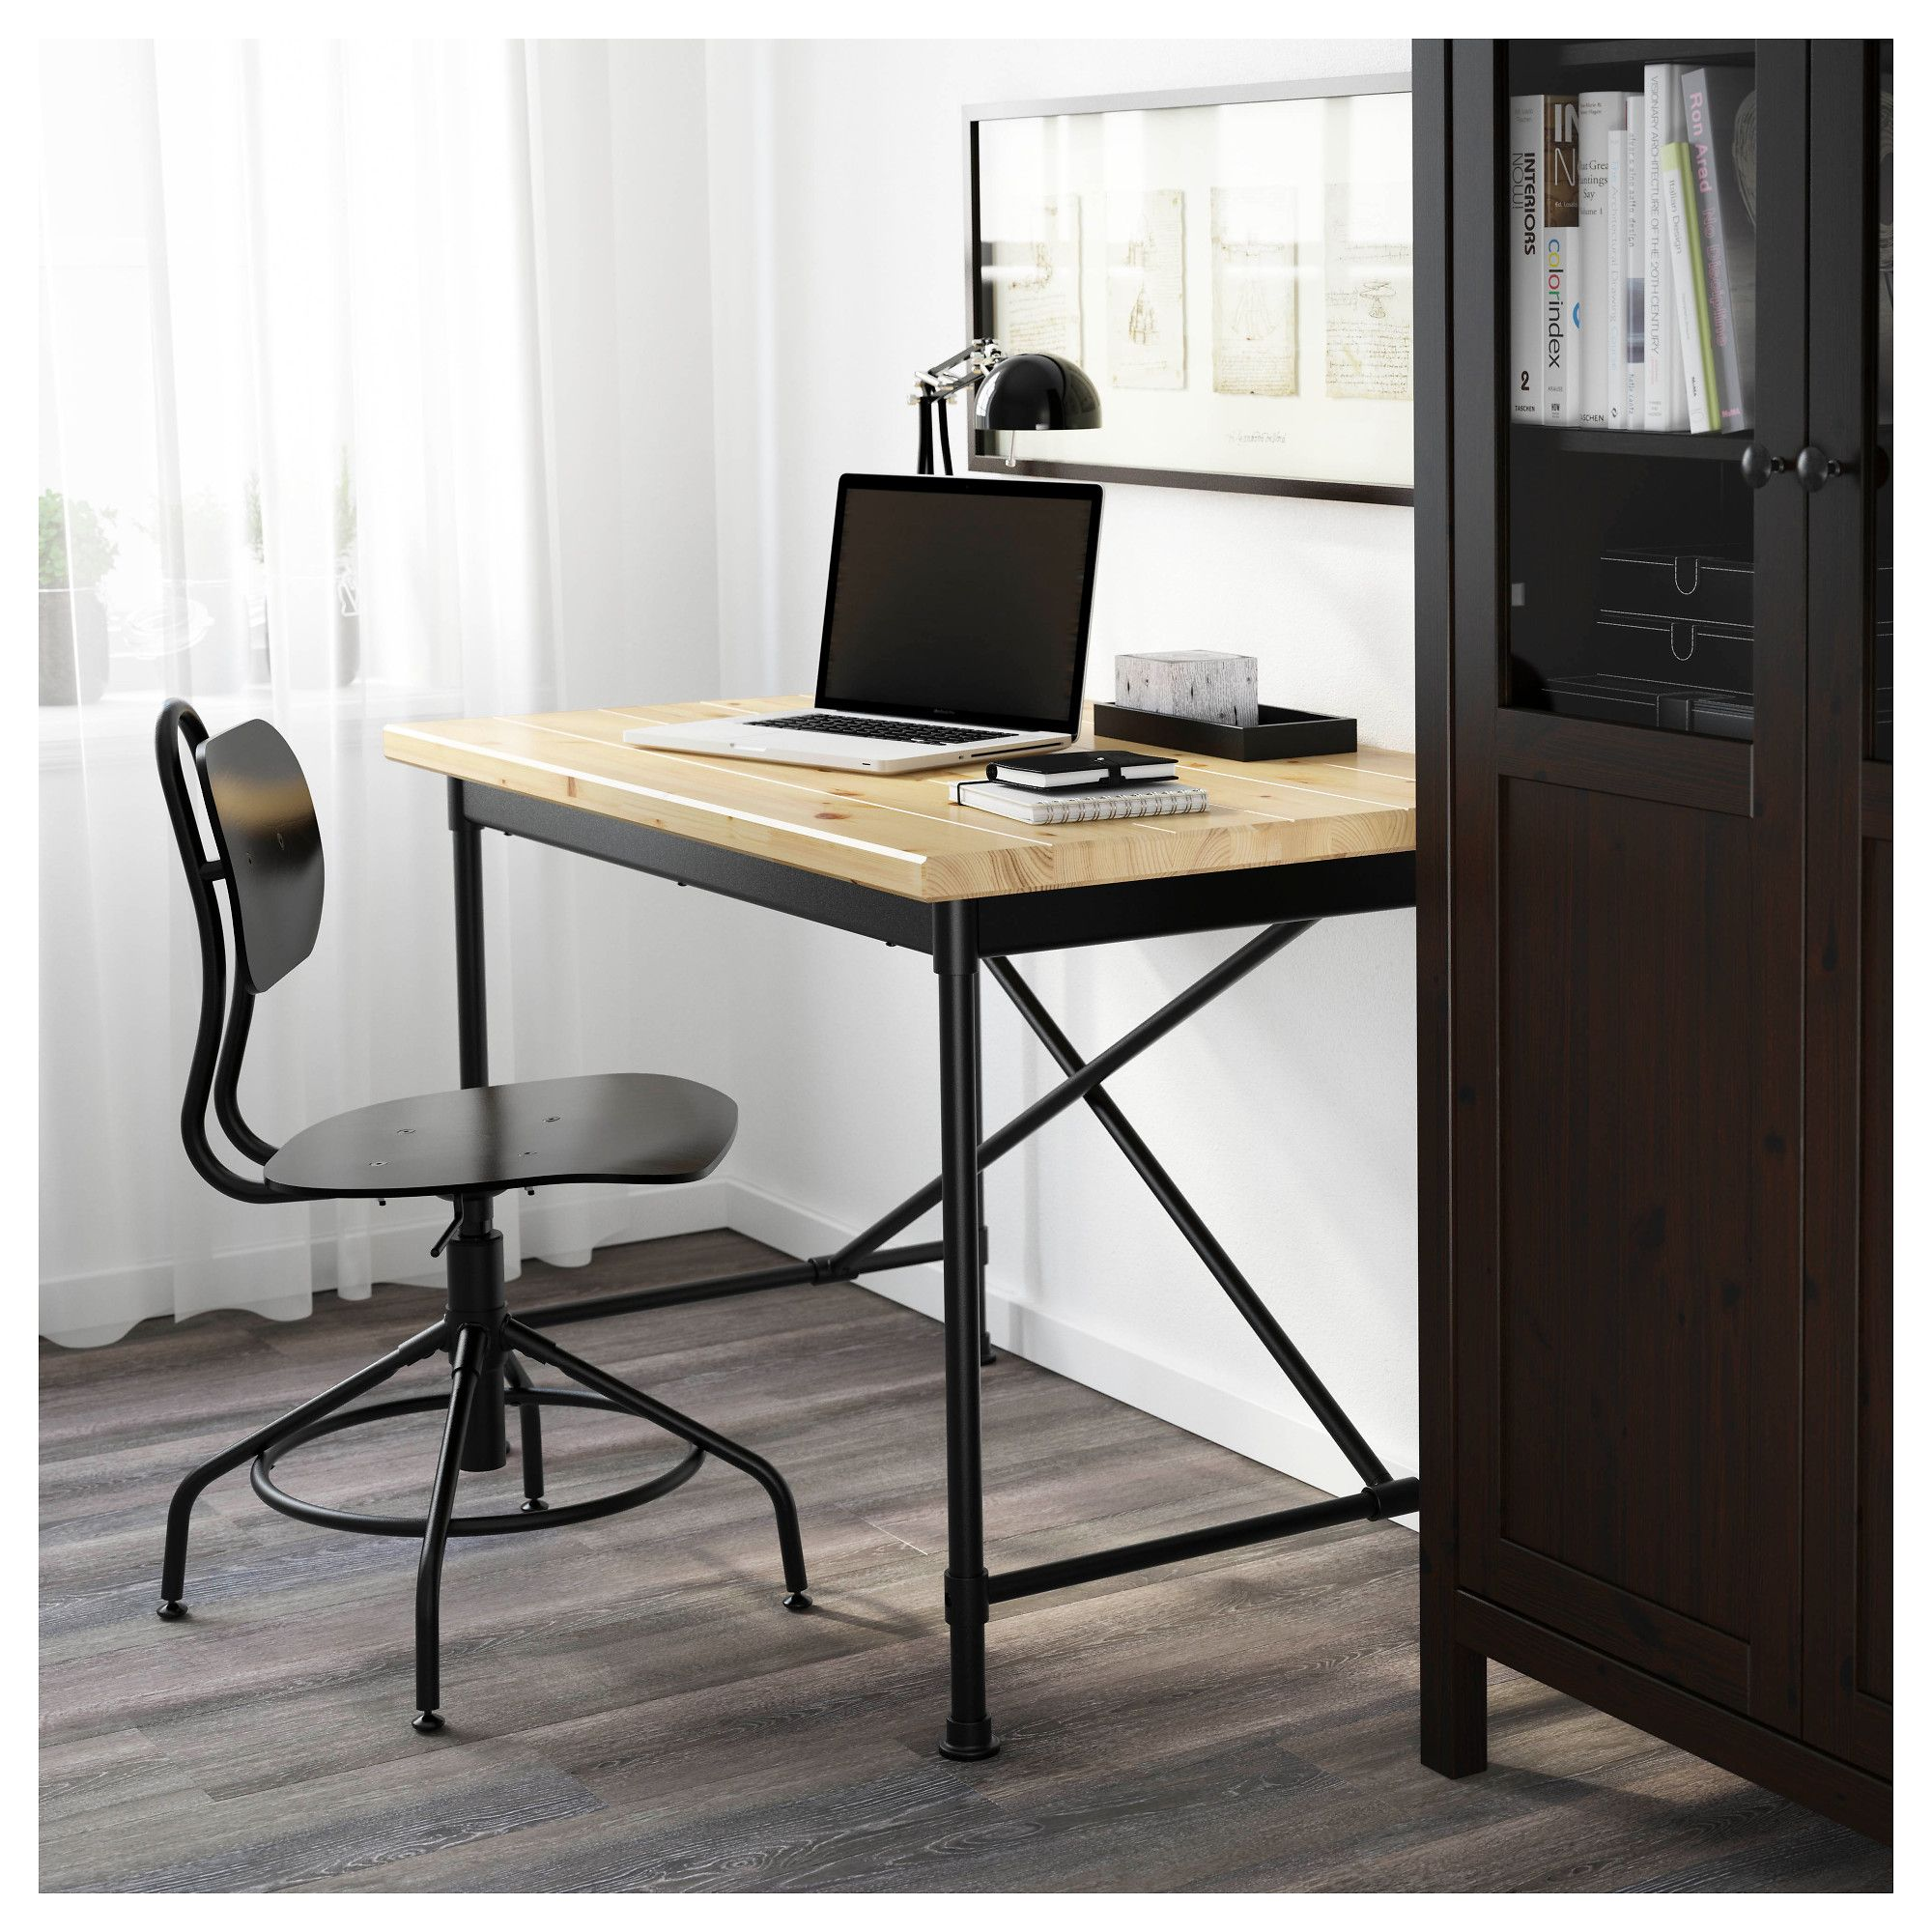 IKEA KULLABERG Pine, Black Desk Home office furniture